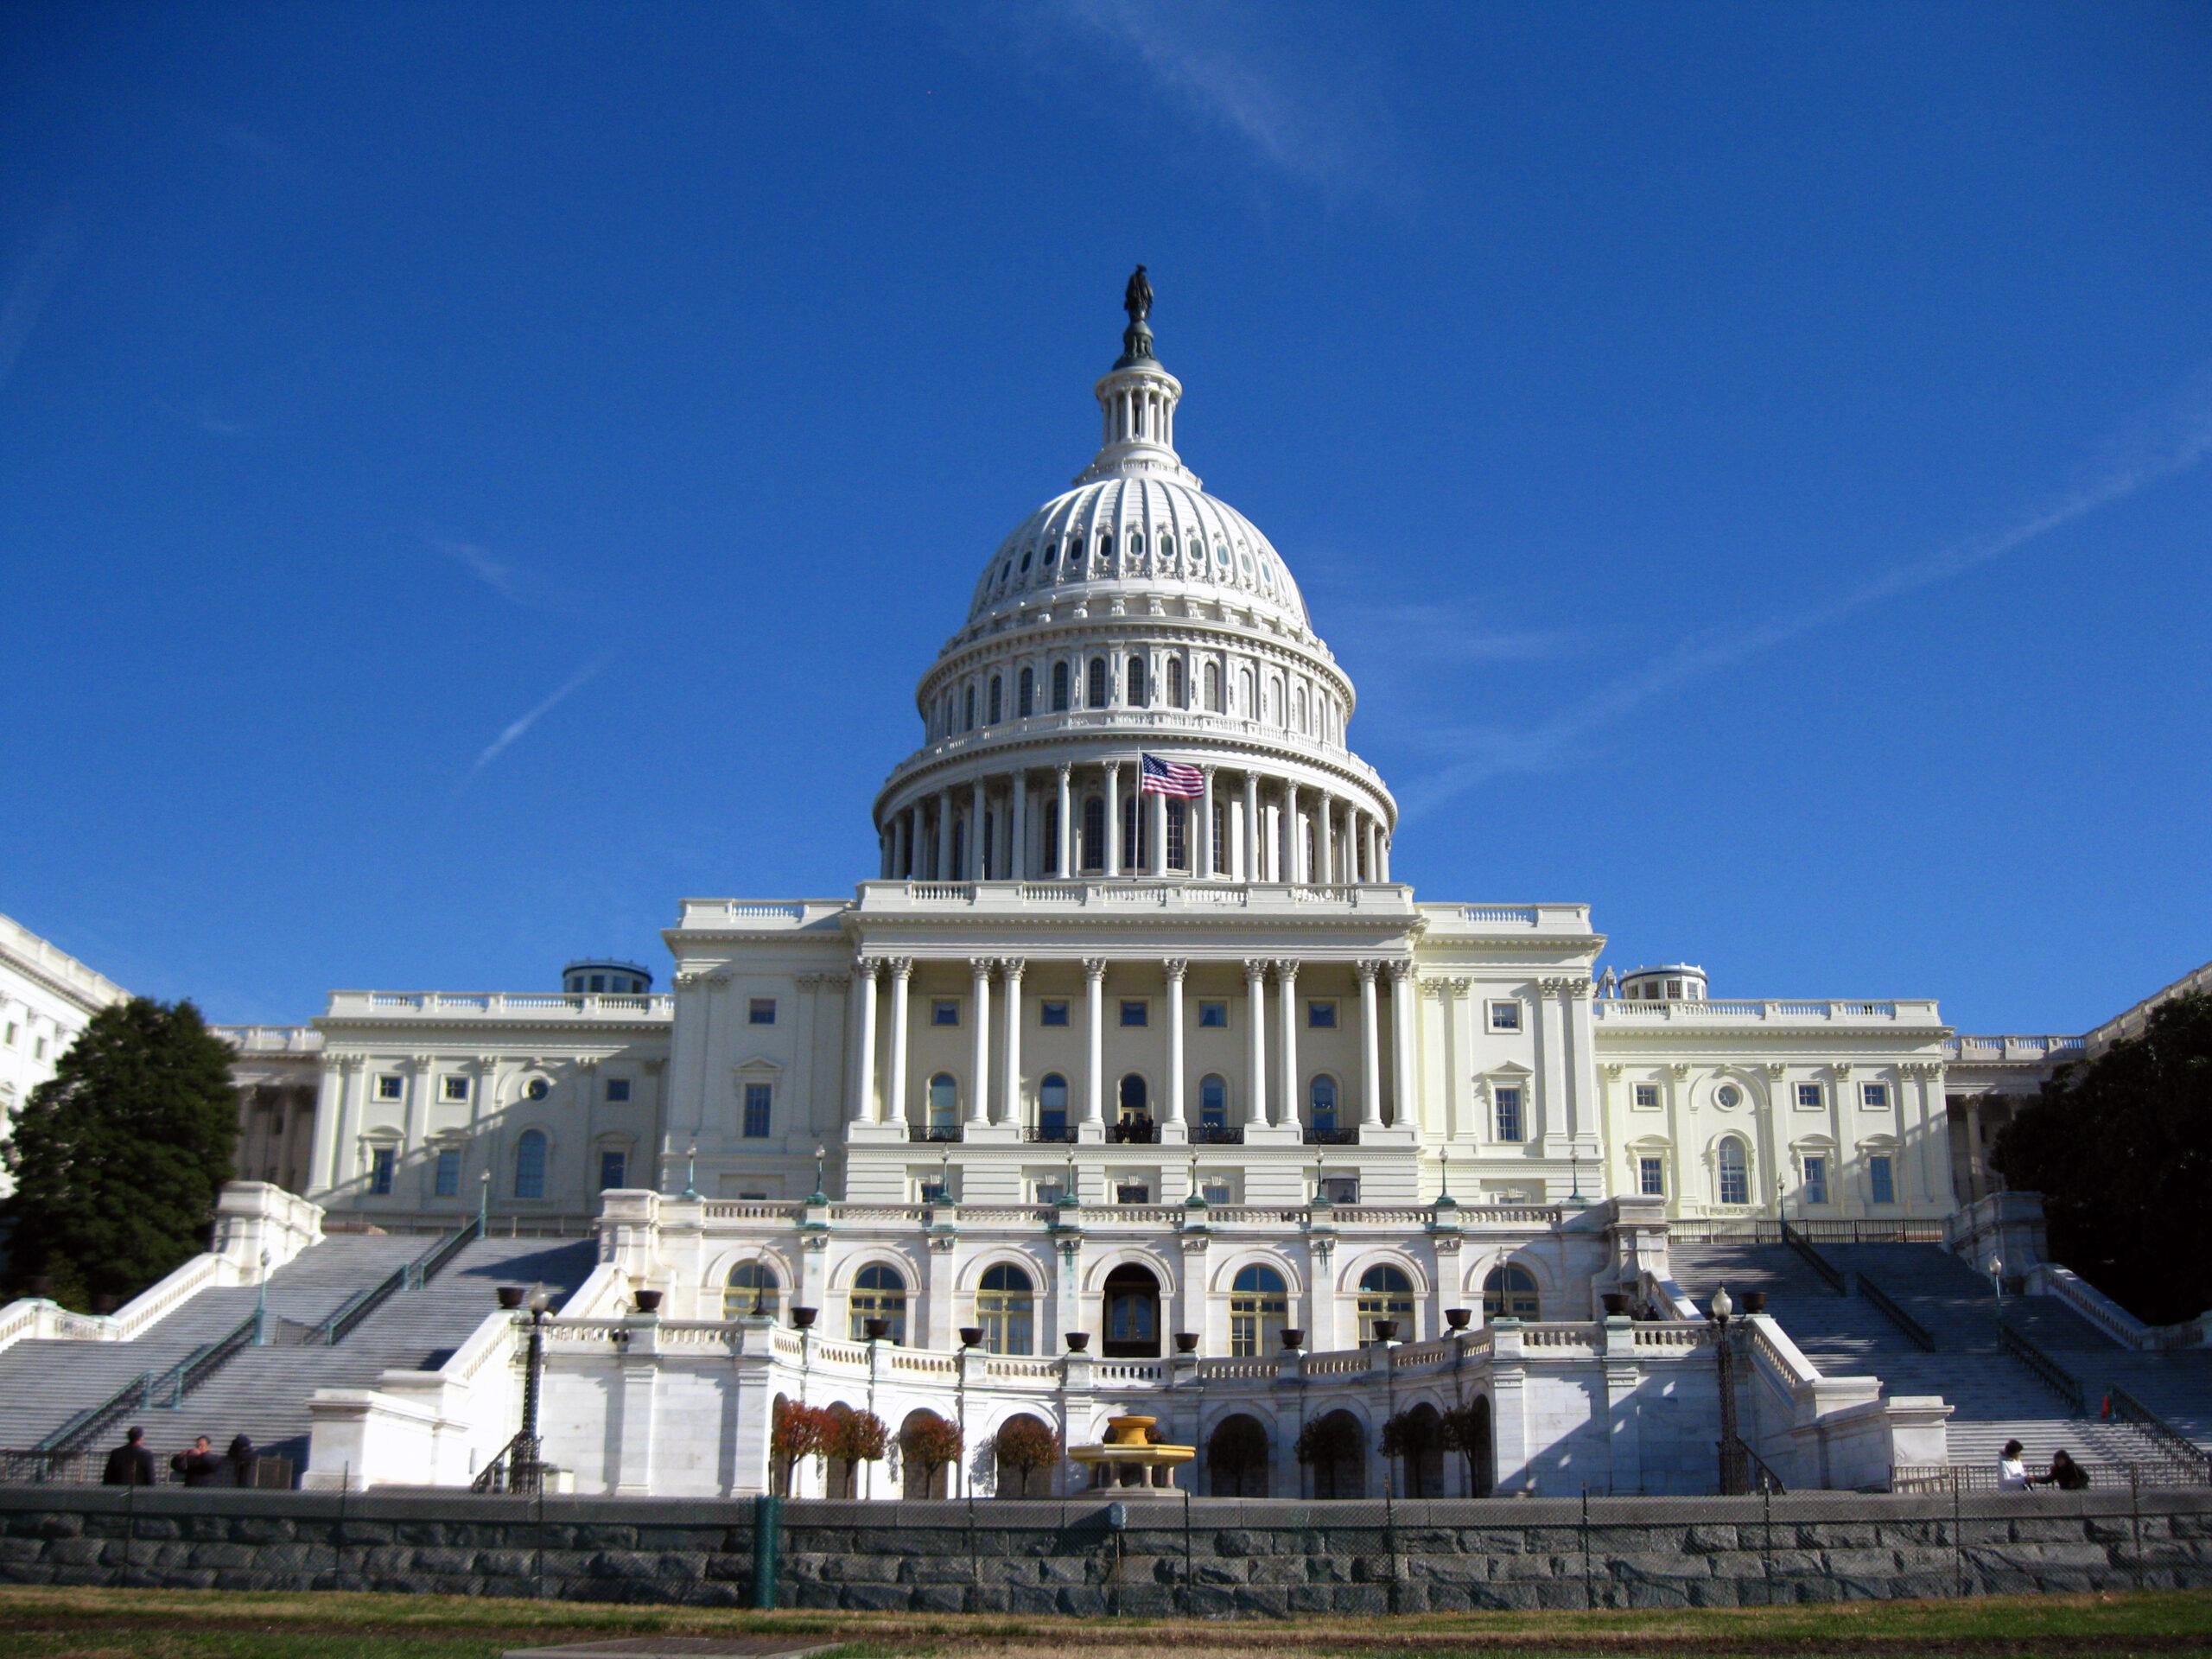 capitol-building-washington-dc-